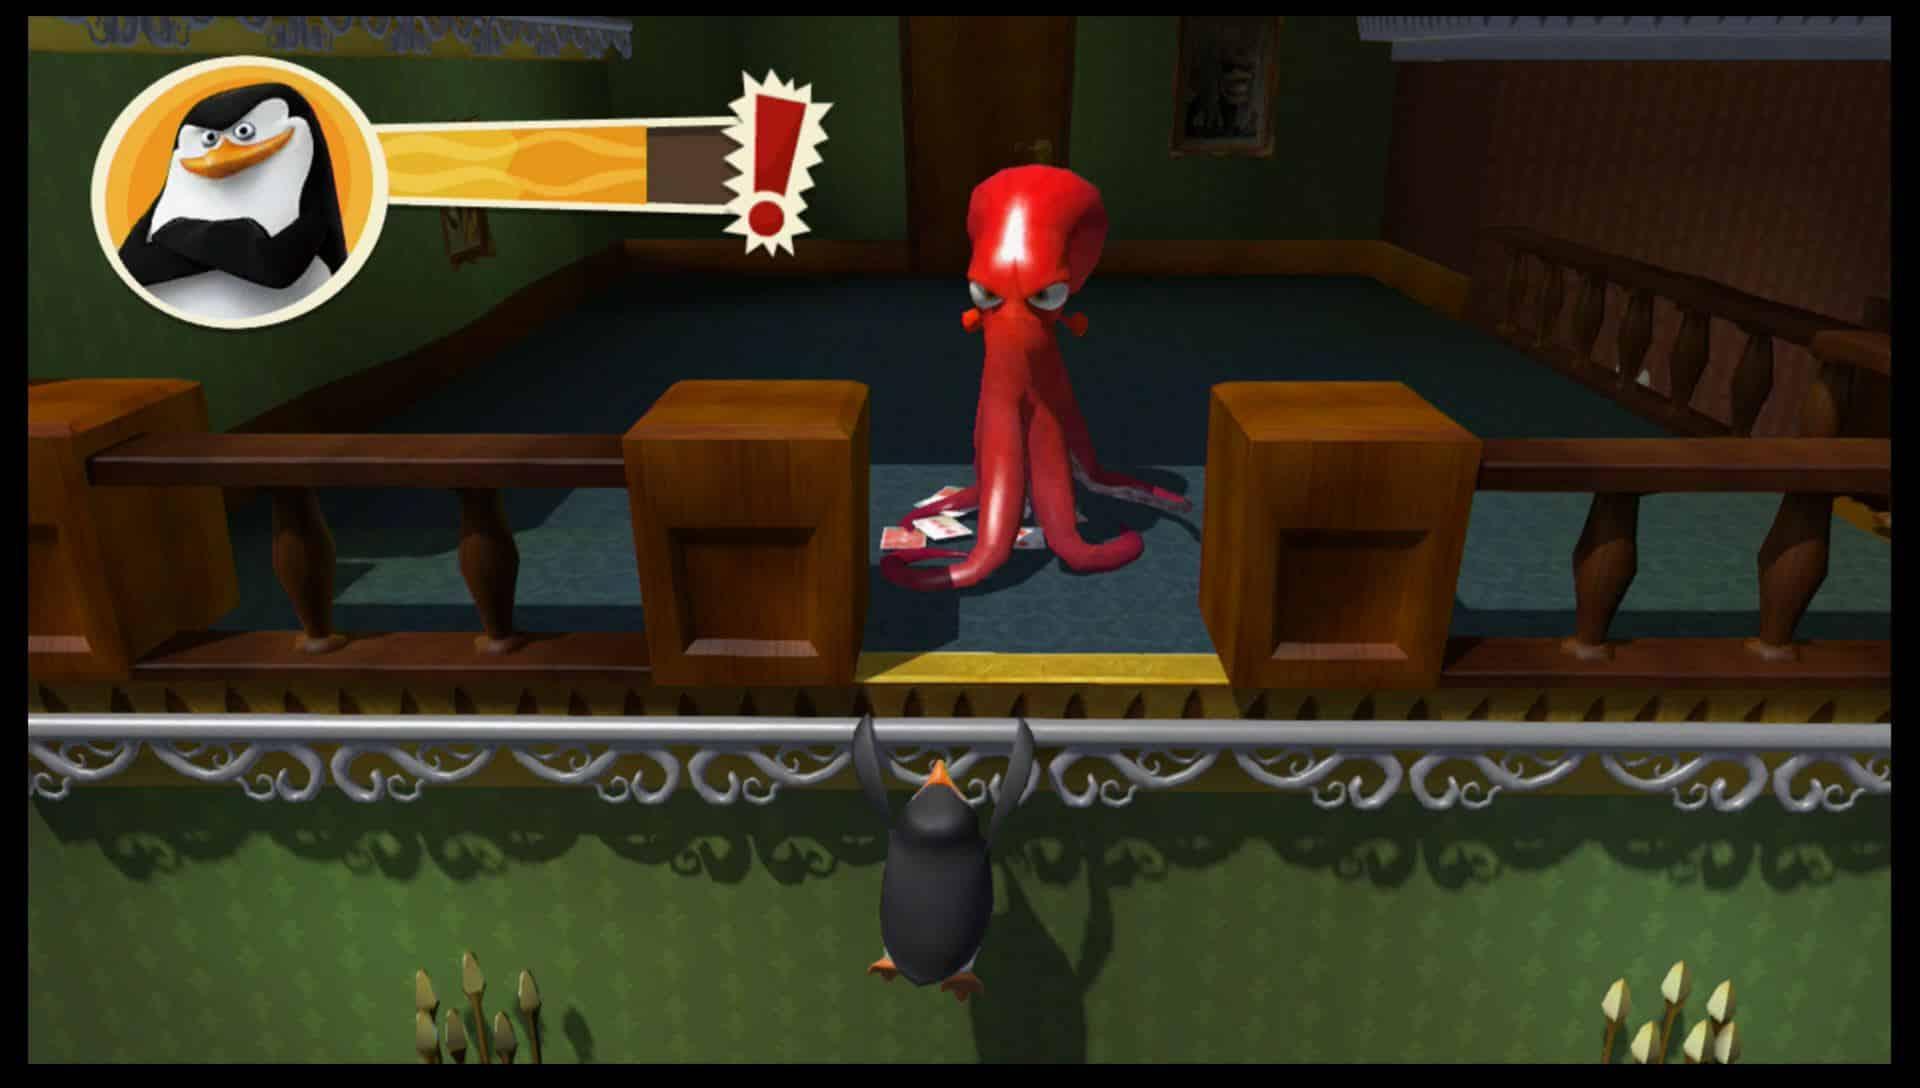 penguins-of-madagascar-screenshot-3